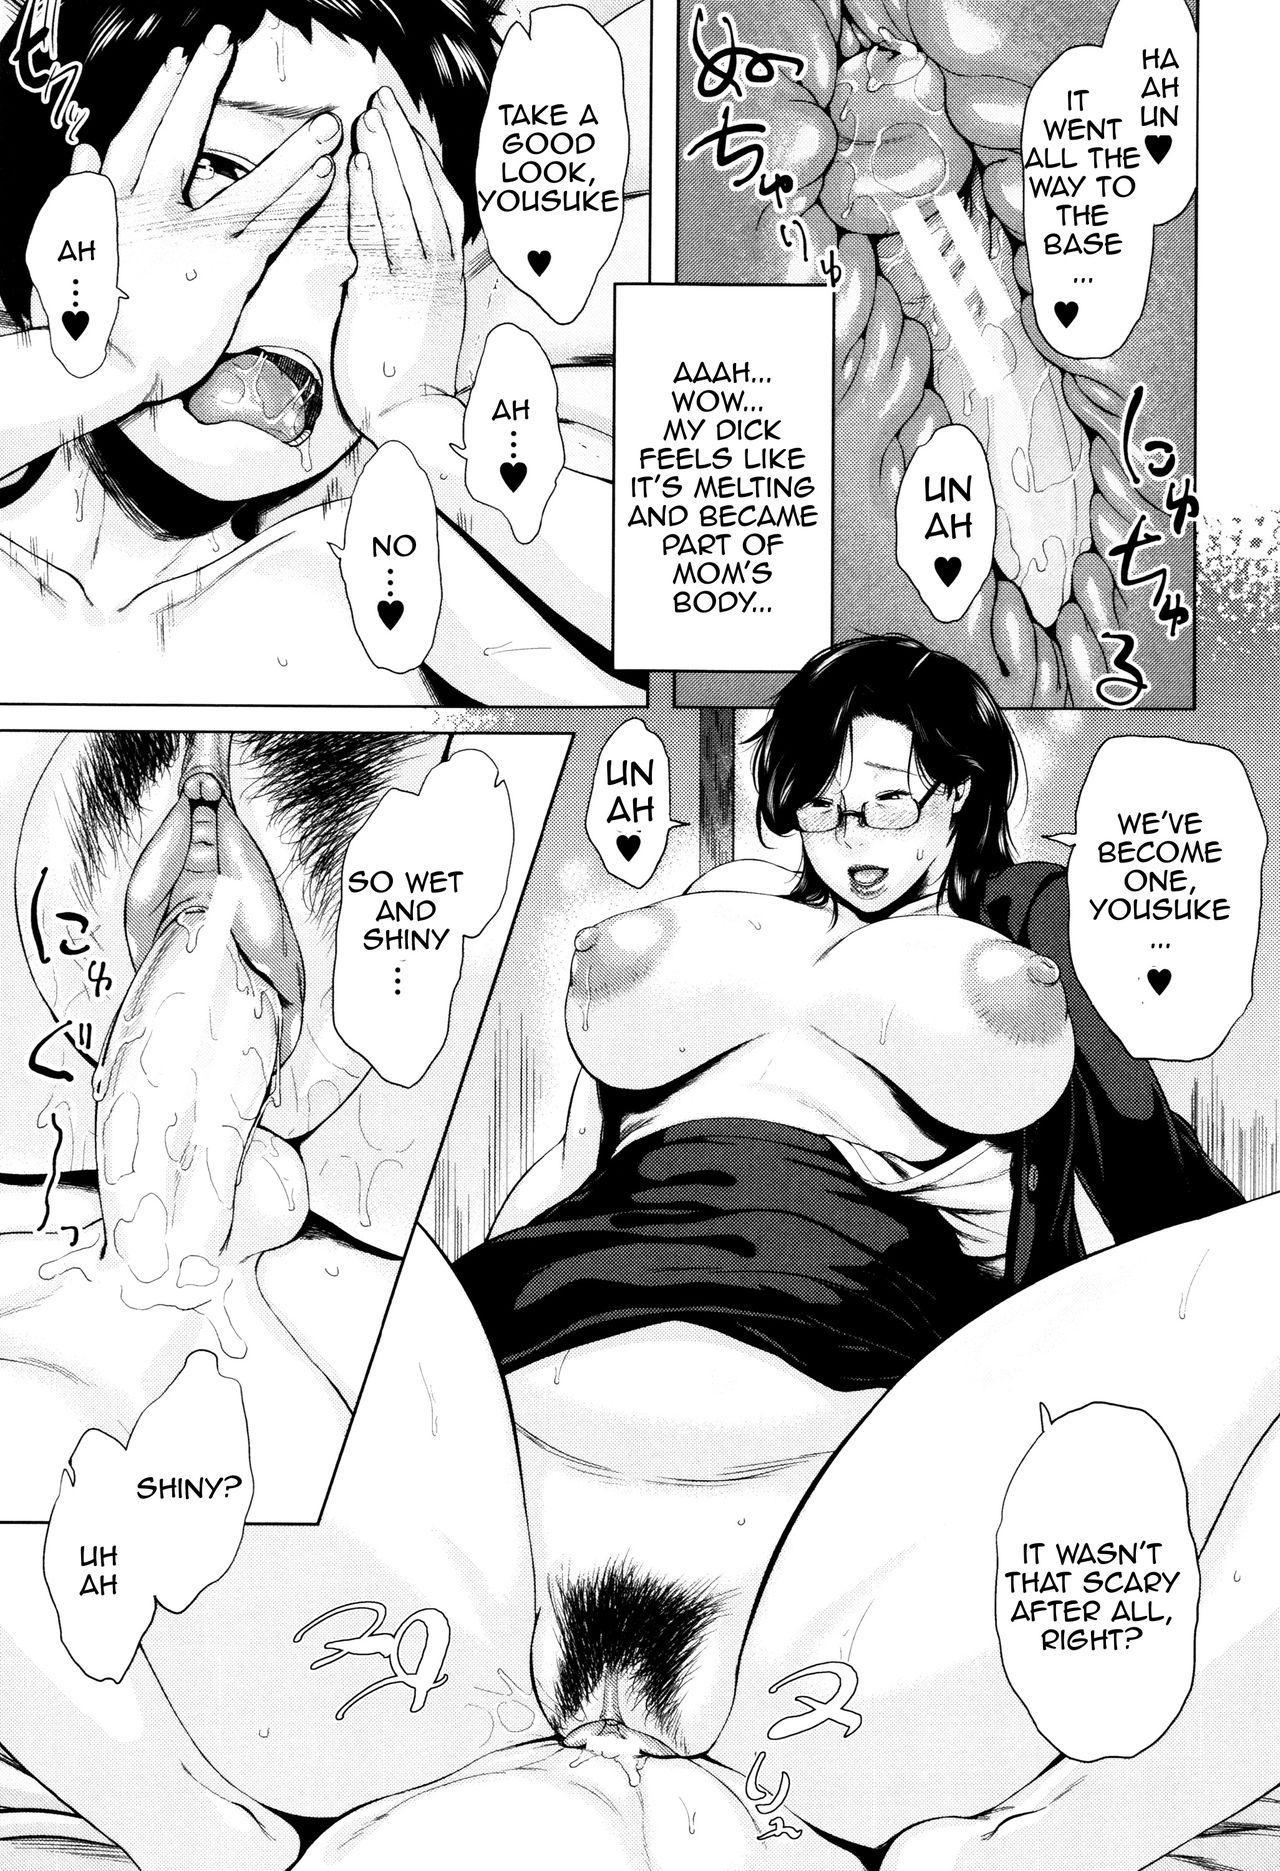 [Jitsuma] Kinyoubi no Haha-tachi e - To Friday's mothers [English] [Amoskandy, desudesu, Kusanyagi] 121